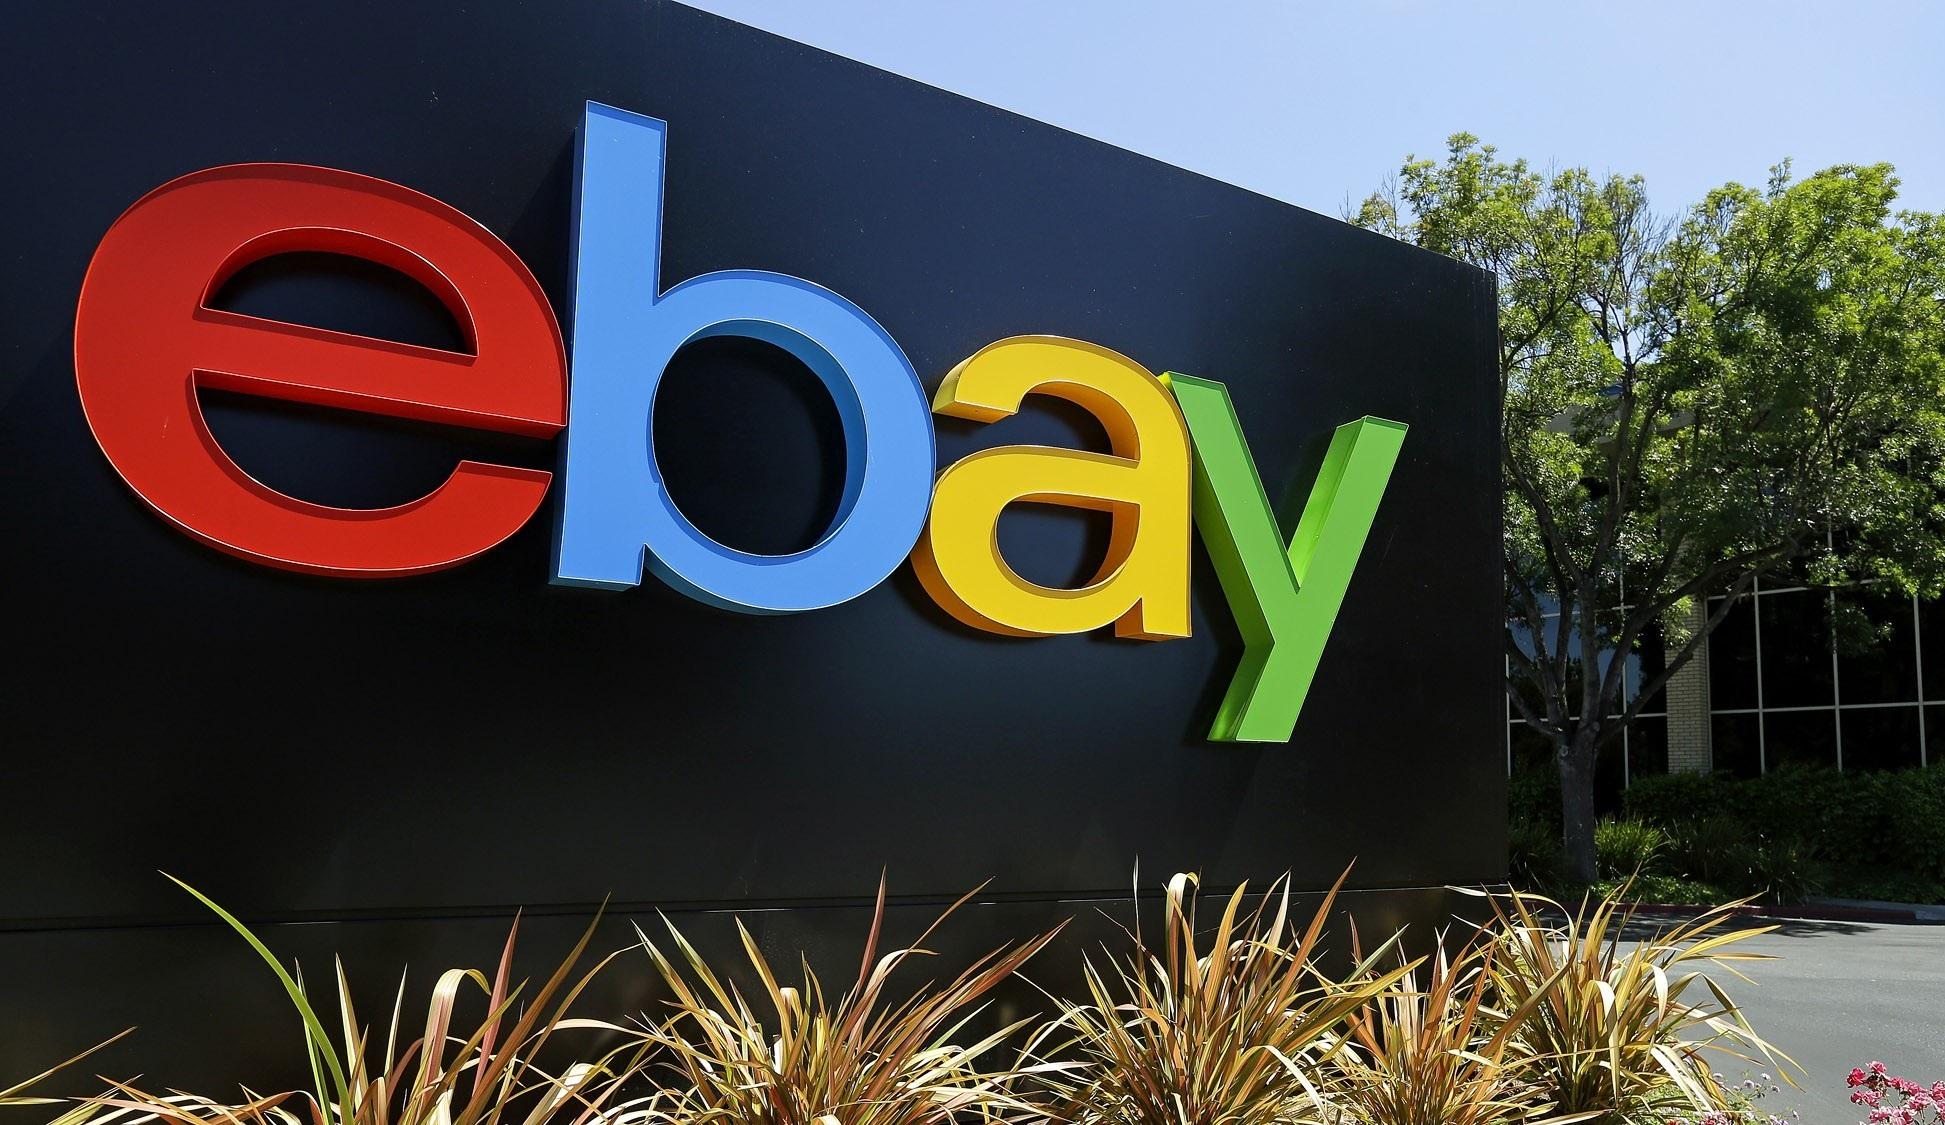 evau-prodaet-sobstvennoe-podrazdelenie-ebay-enterprise-za-925-mln_171